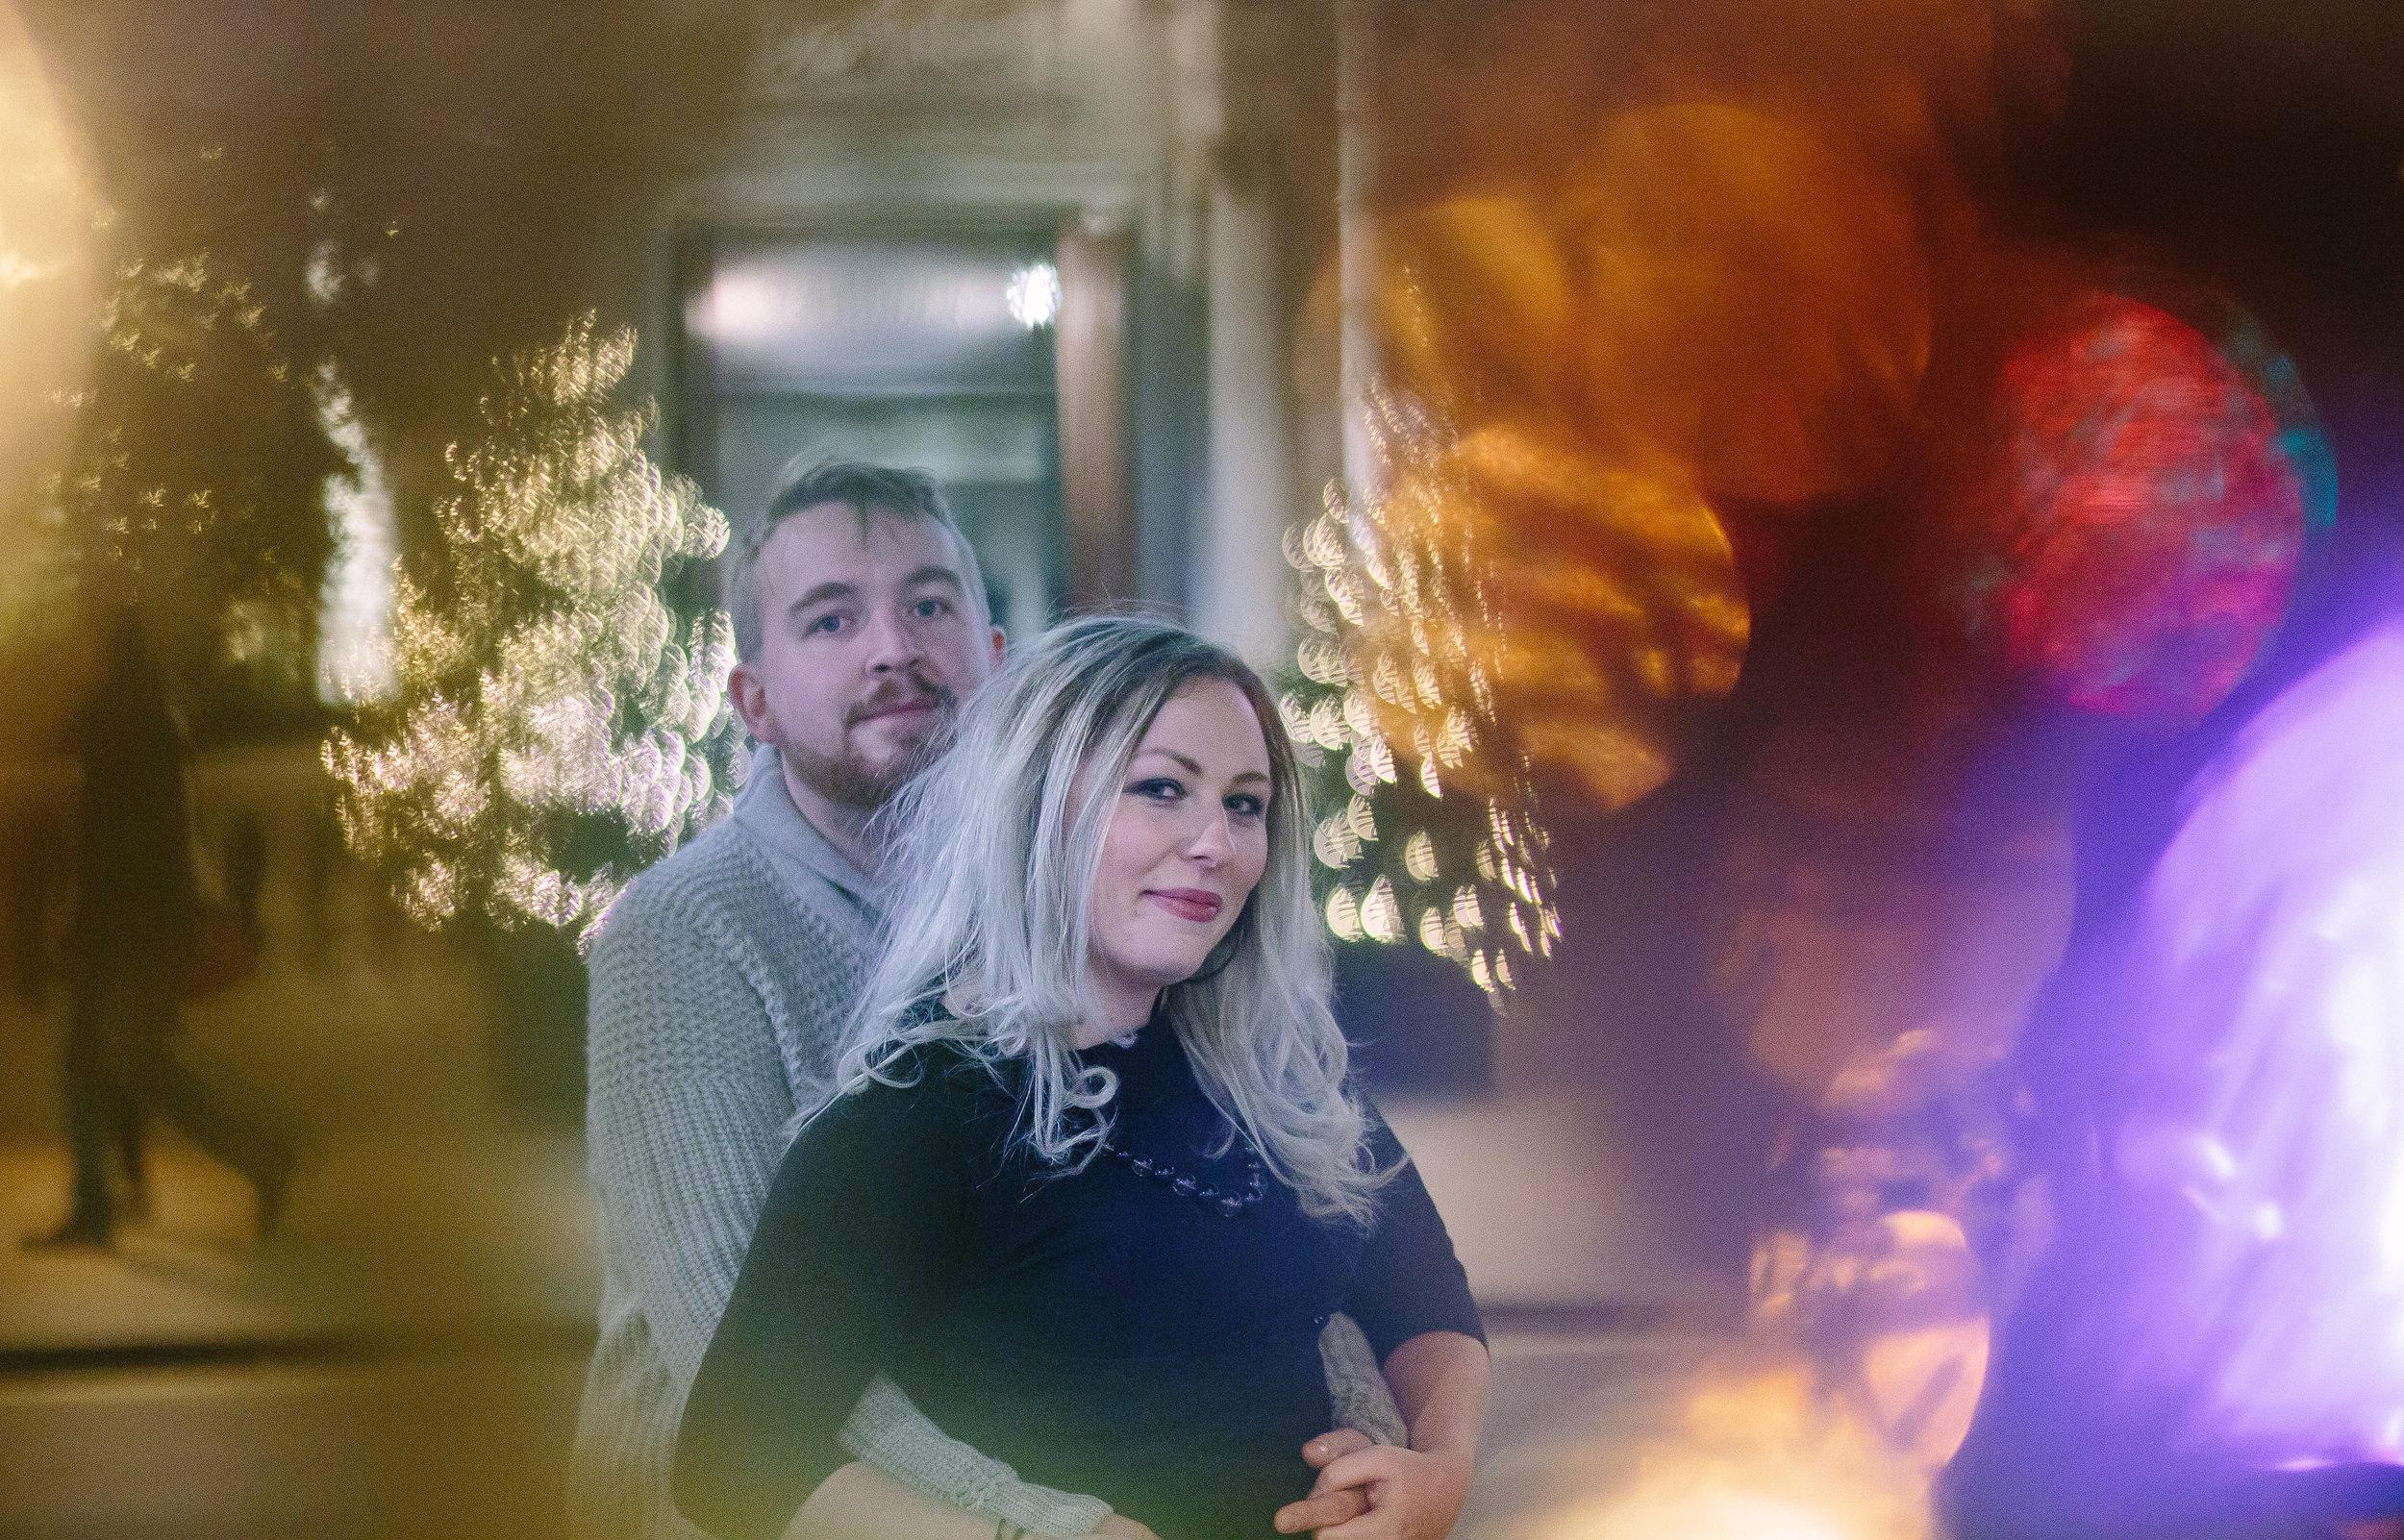 london-oxford-street-christmas-lights-engagement-wedding-photography-14